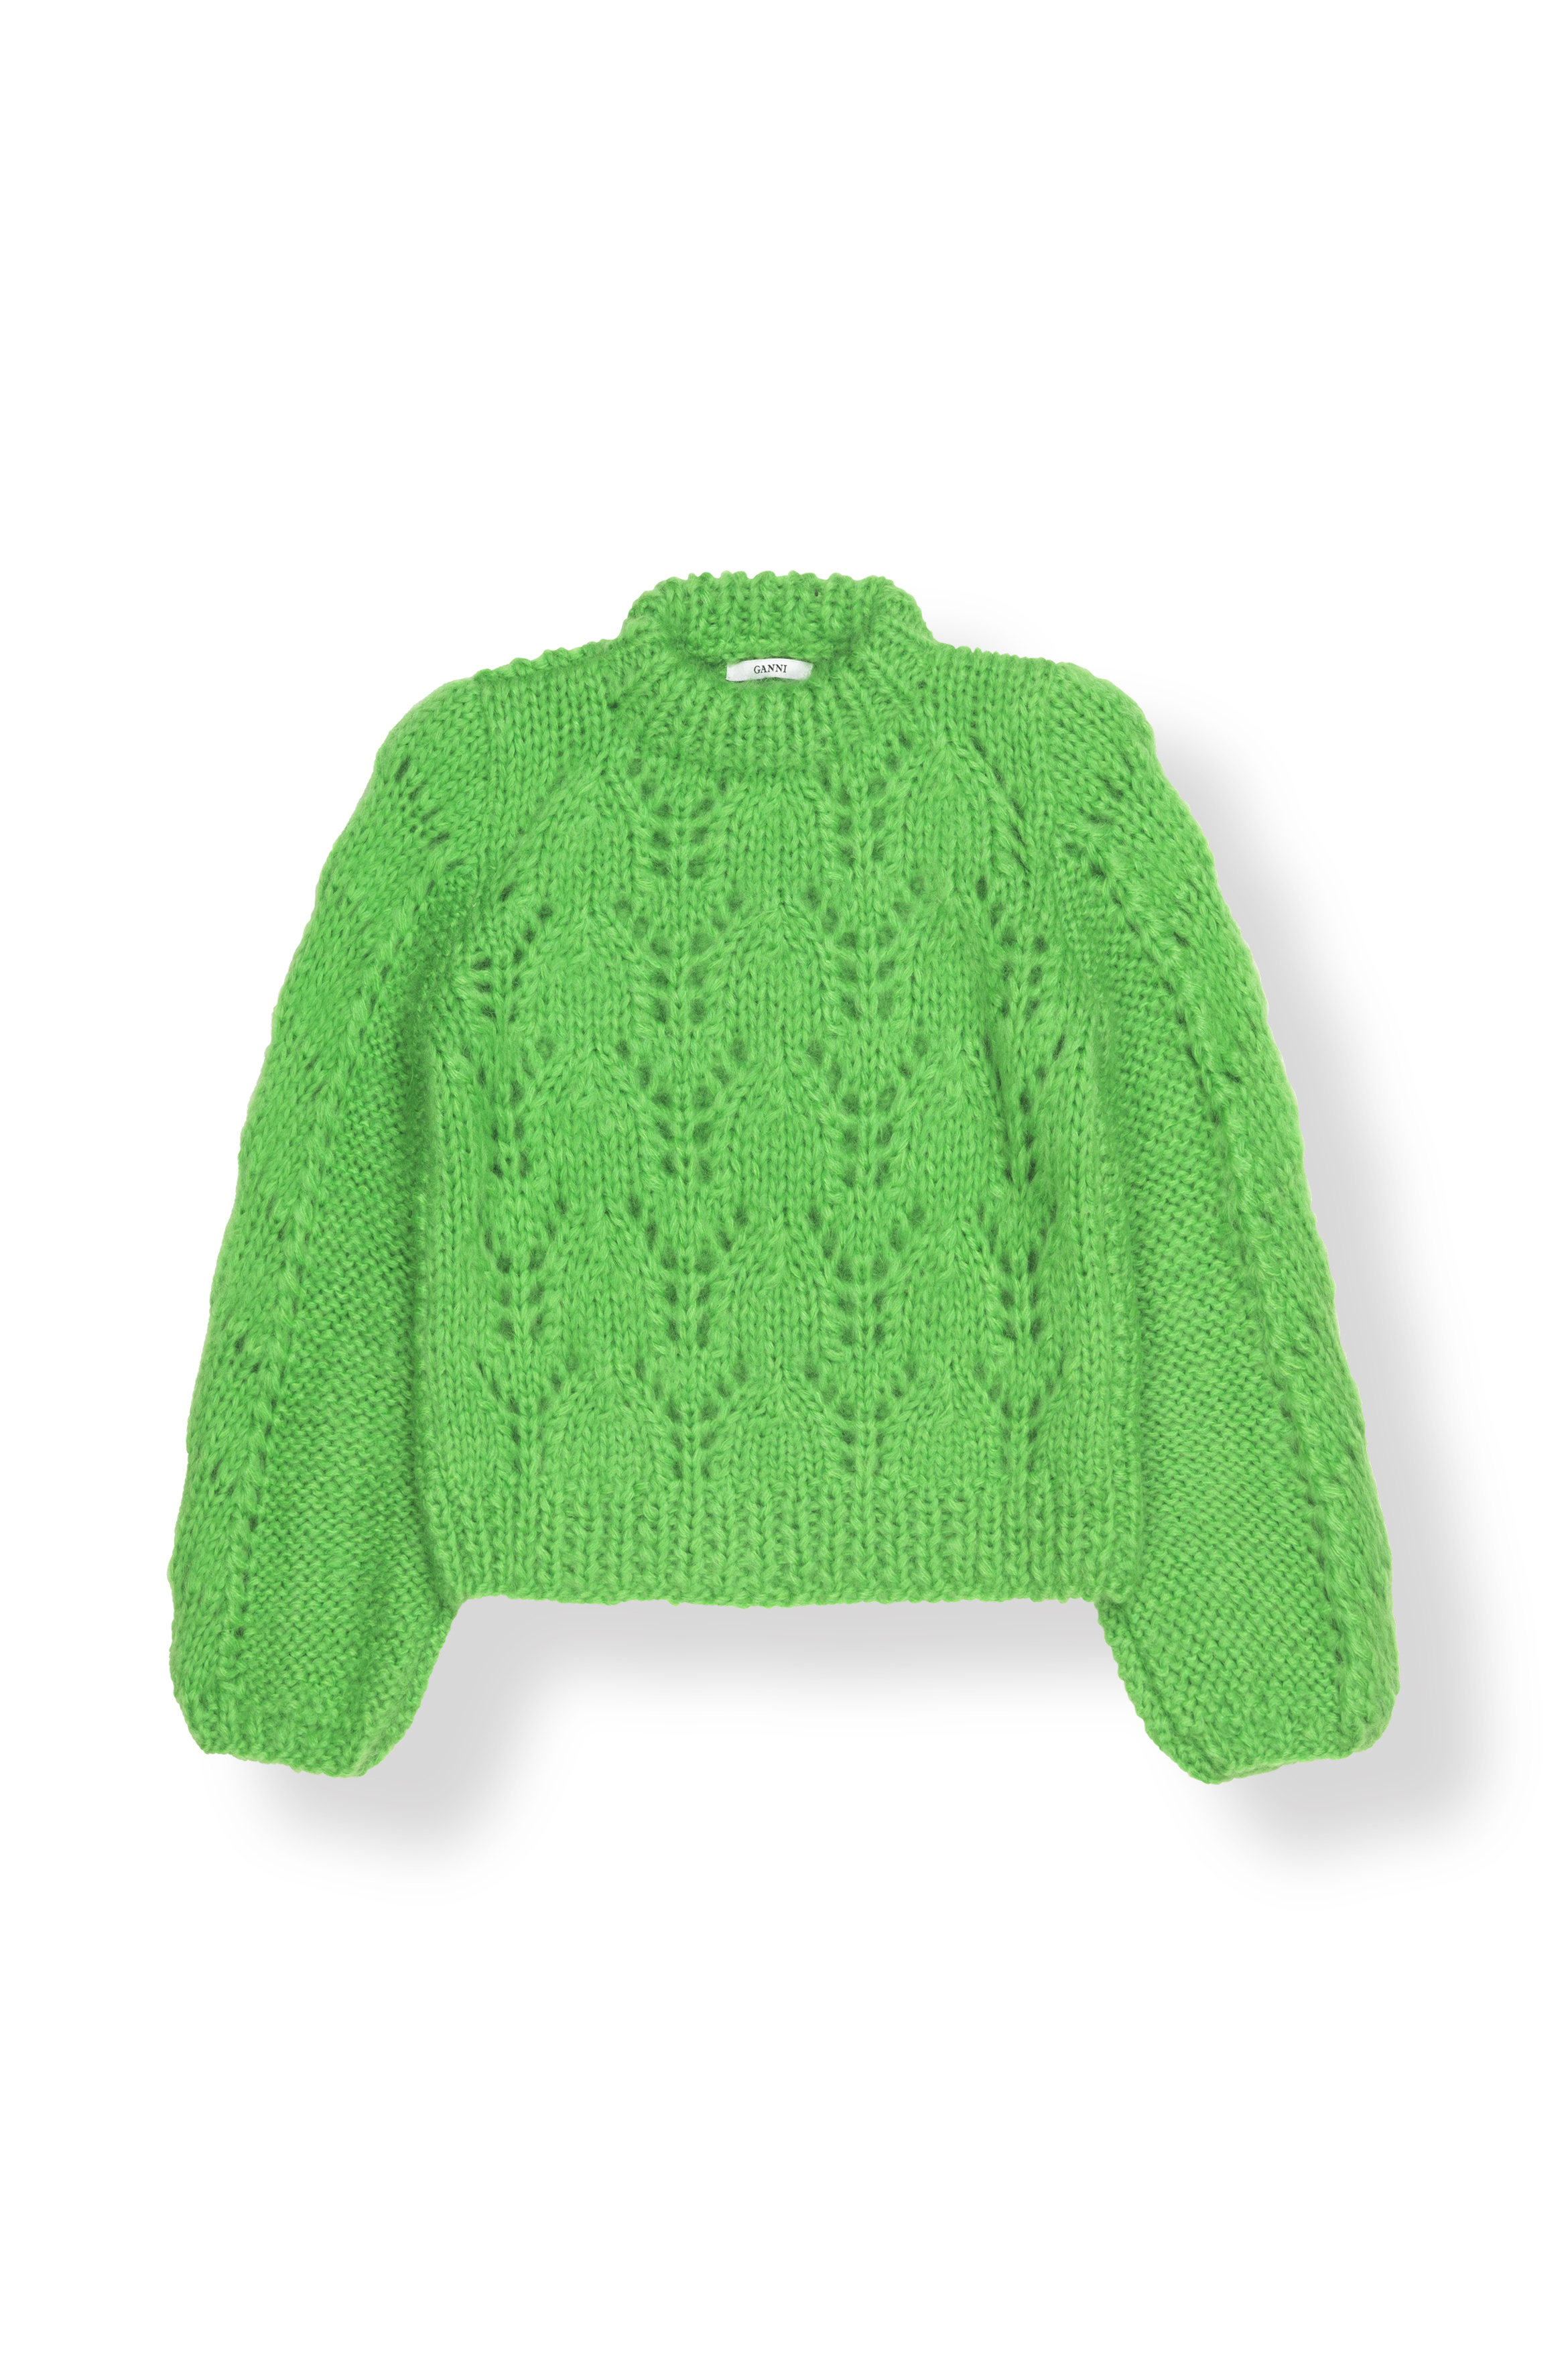 Ganni The Julliard Mohair Knit Classic Green, k1101